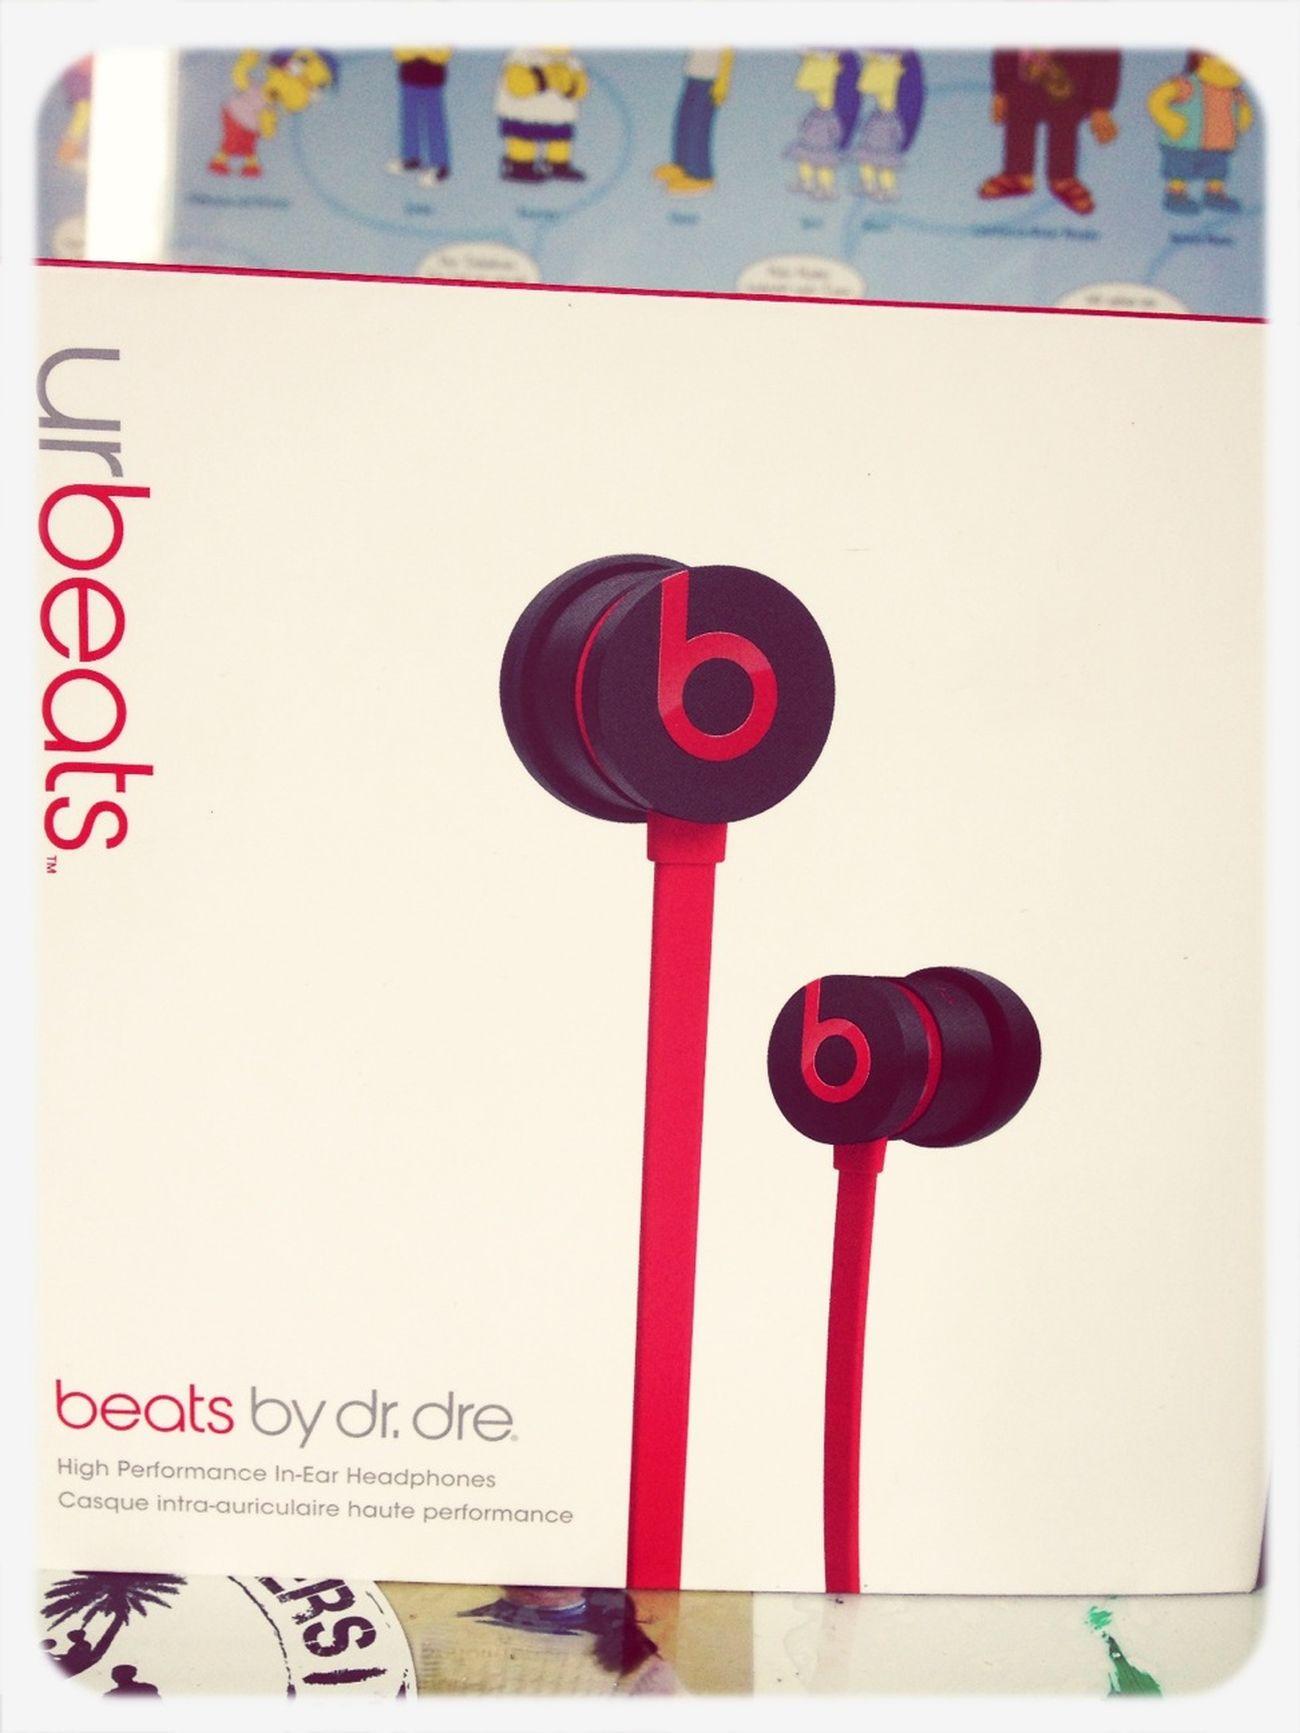 Meine Beats